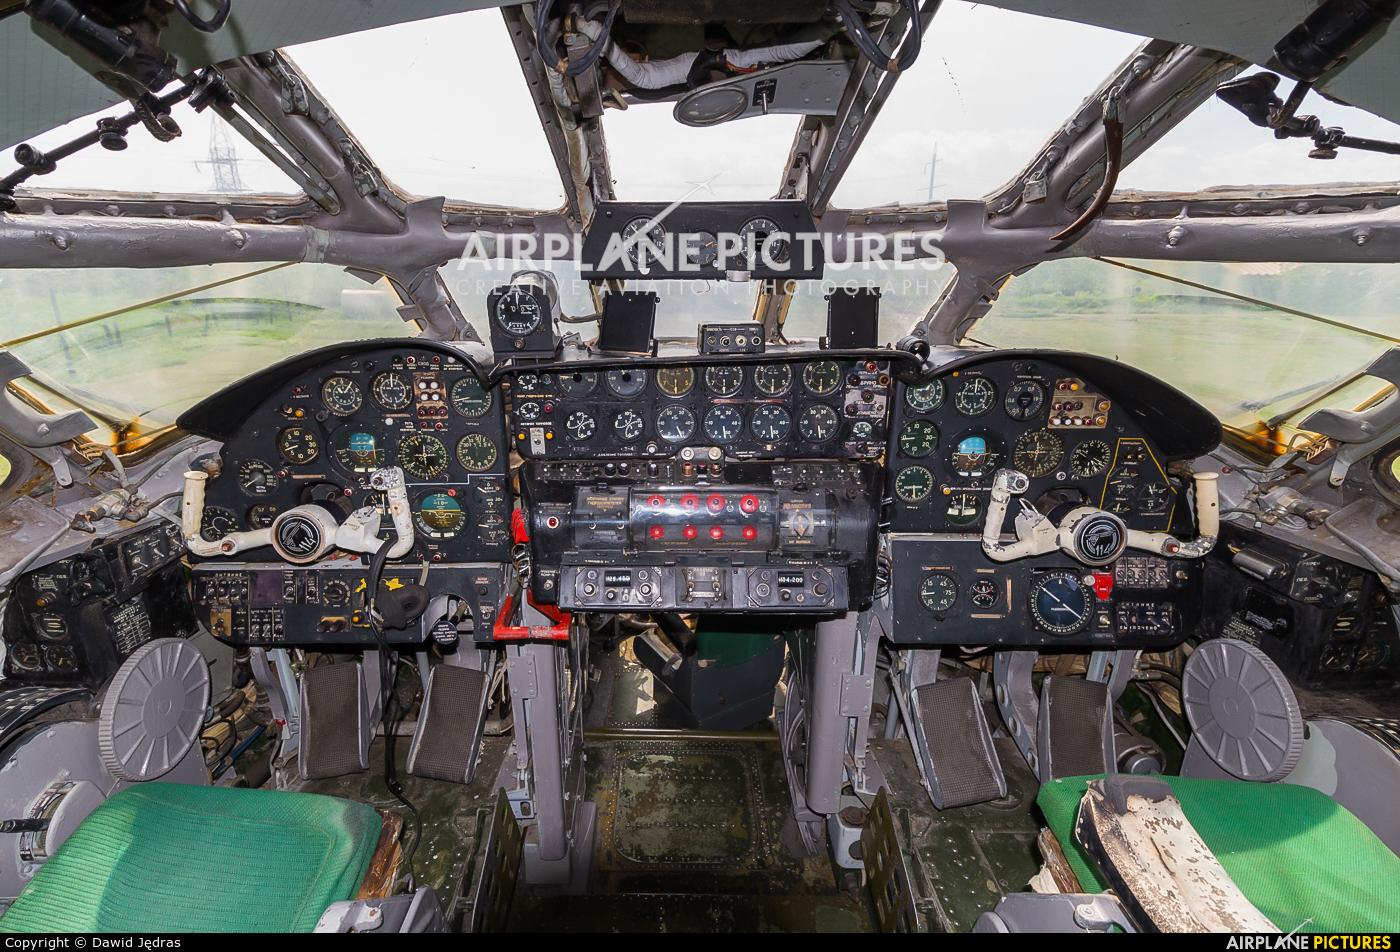 Aeroflot CCCP-76485 aircraft at Off Airport - Ukraine